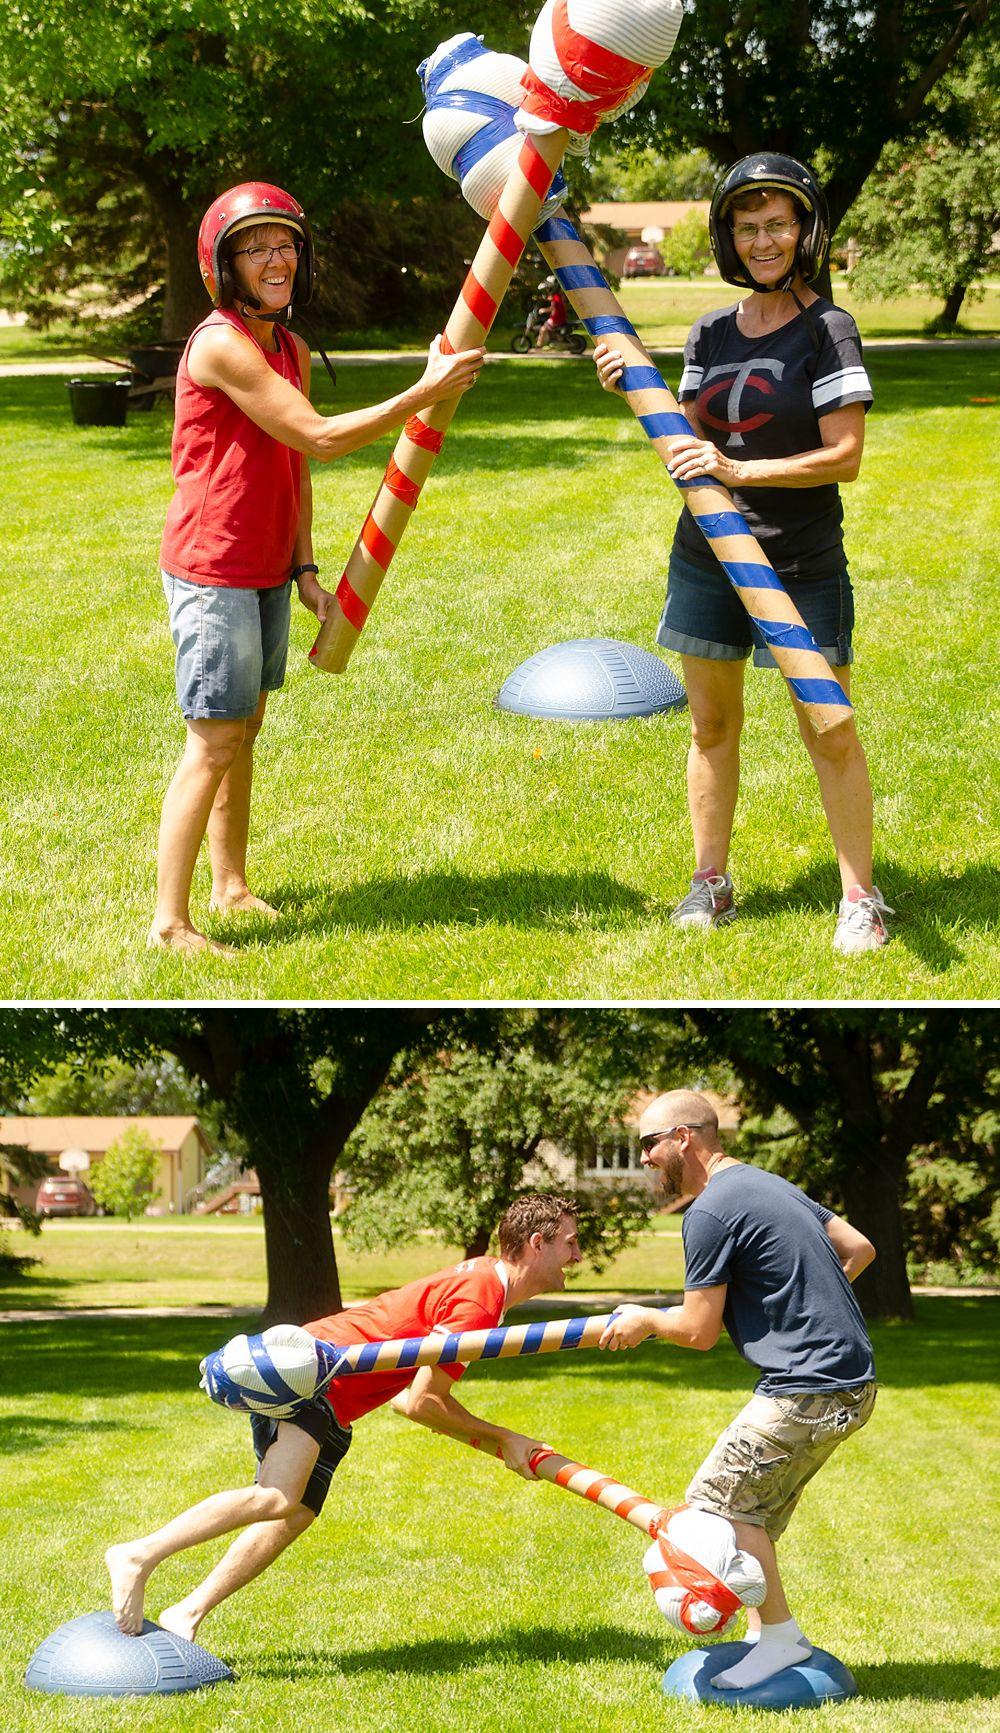 Homemade Backyard Gladiator Jousting Game at Family Summer ...